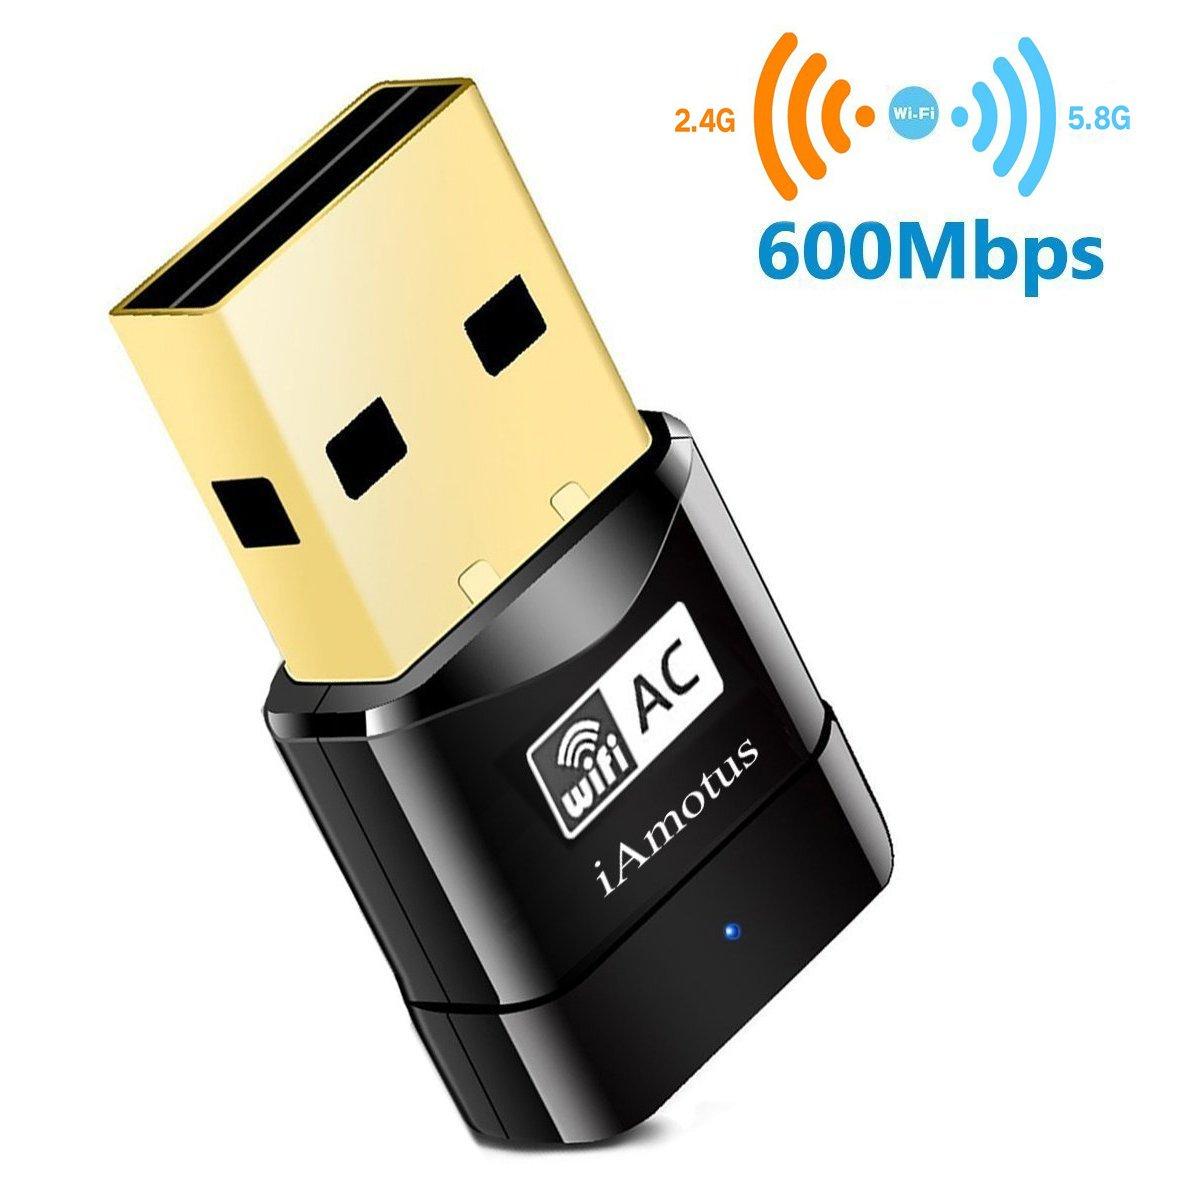 iAmotus USB WiFi Adaptateur [Garantie à 2 Ans] AC600 Mbps Mini Double Bande Wireless WiFi (5GHz 433Mbps/2.4GHz 150Mbps) sans Fil Dongles WLAN Stick pour PC Windows XP/Vista/ 7/8/ 10 Linux Mac OS product image